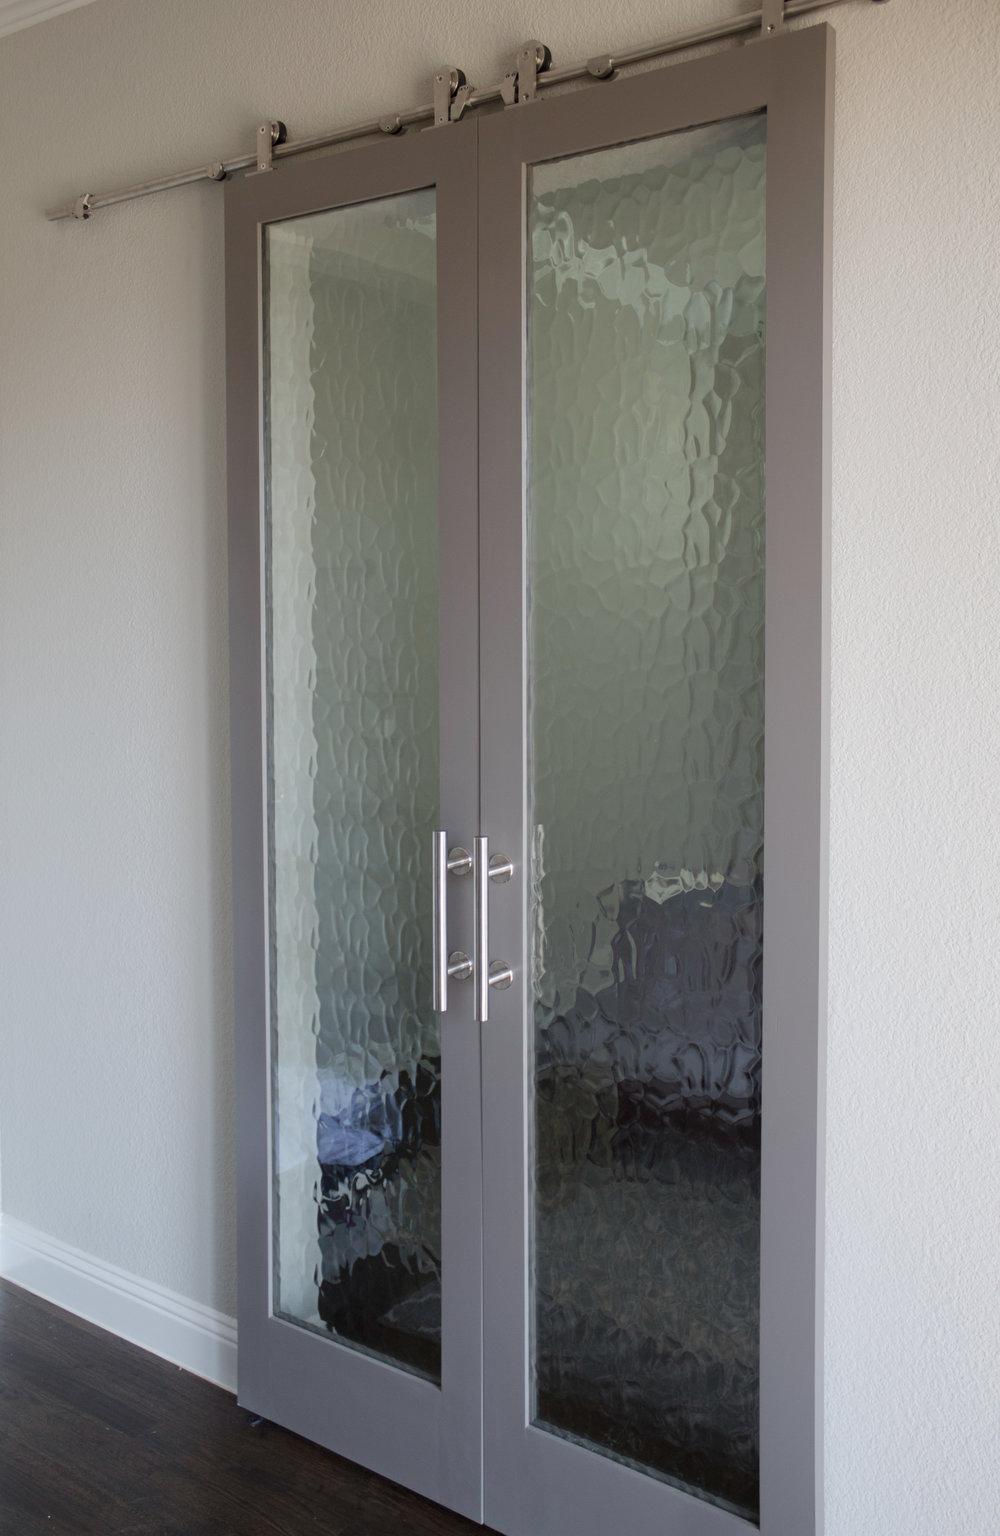 Flemish Glass With Gray Border (Double Barn Door Hardware)